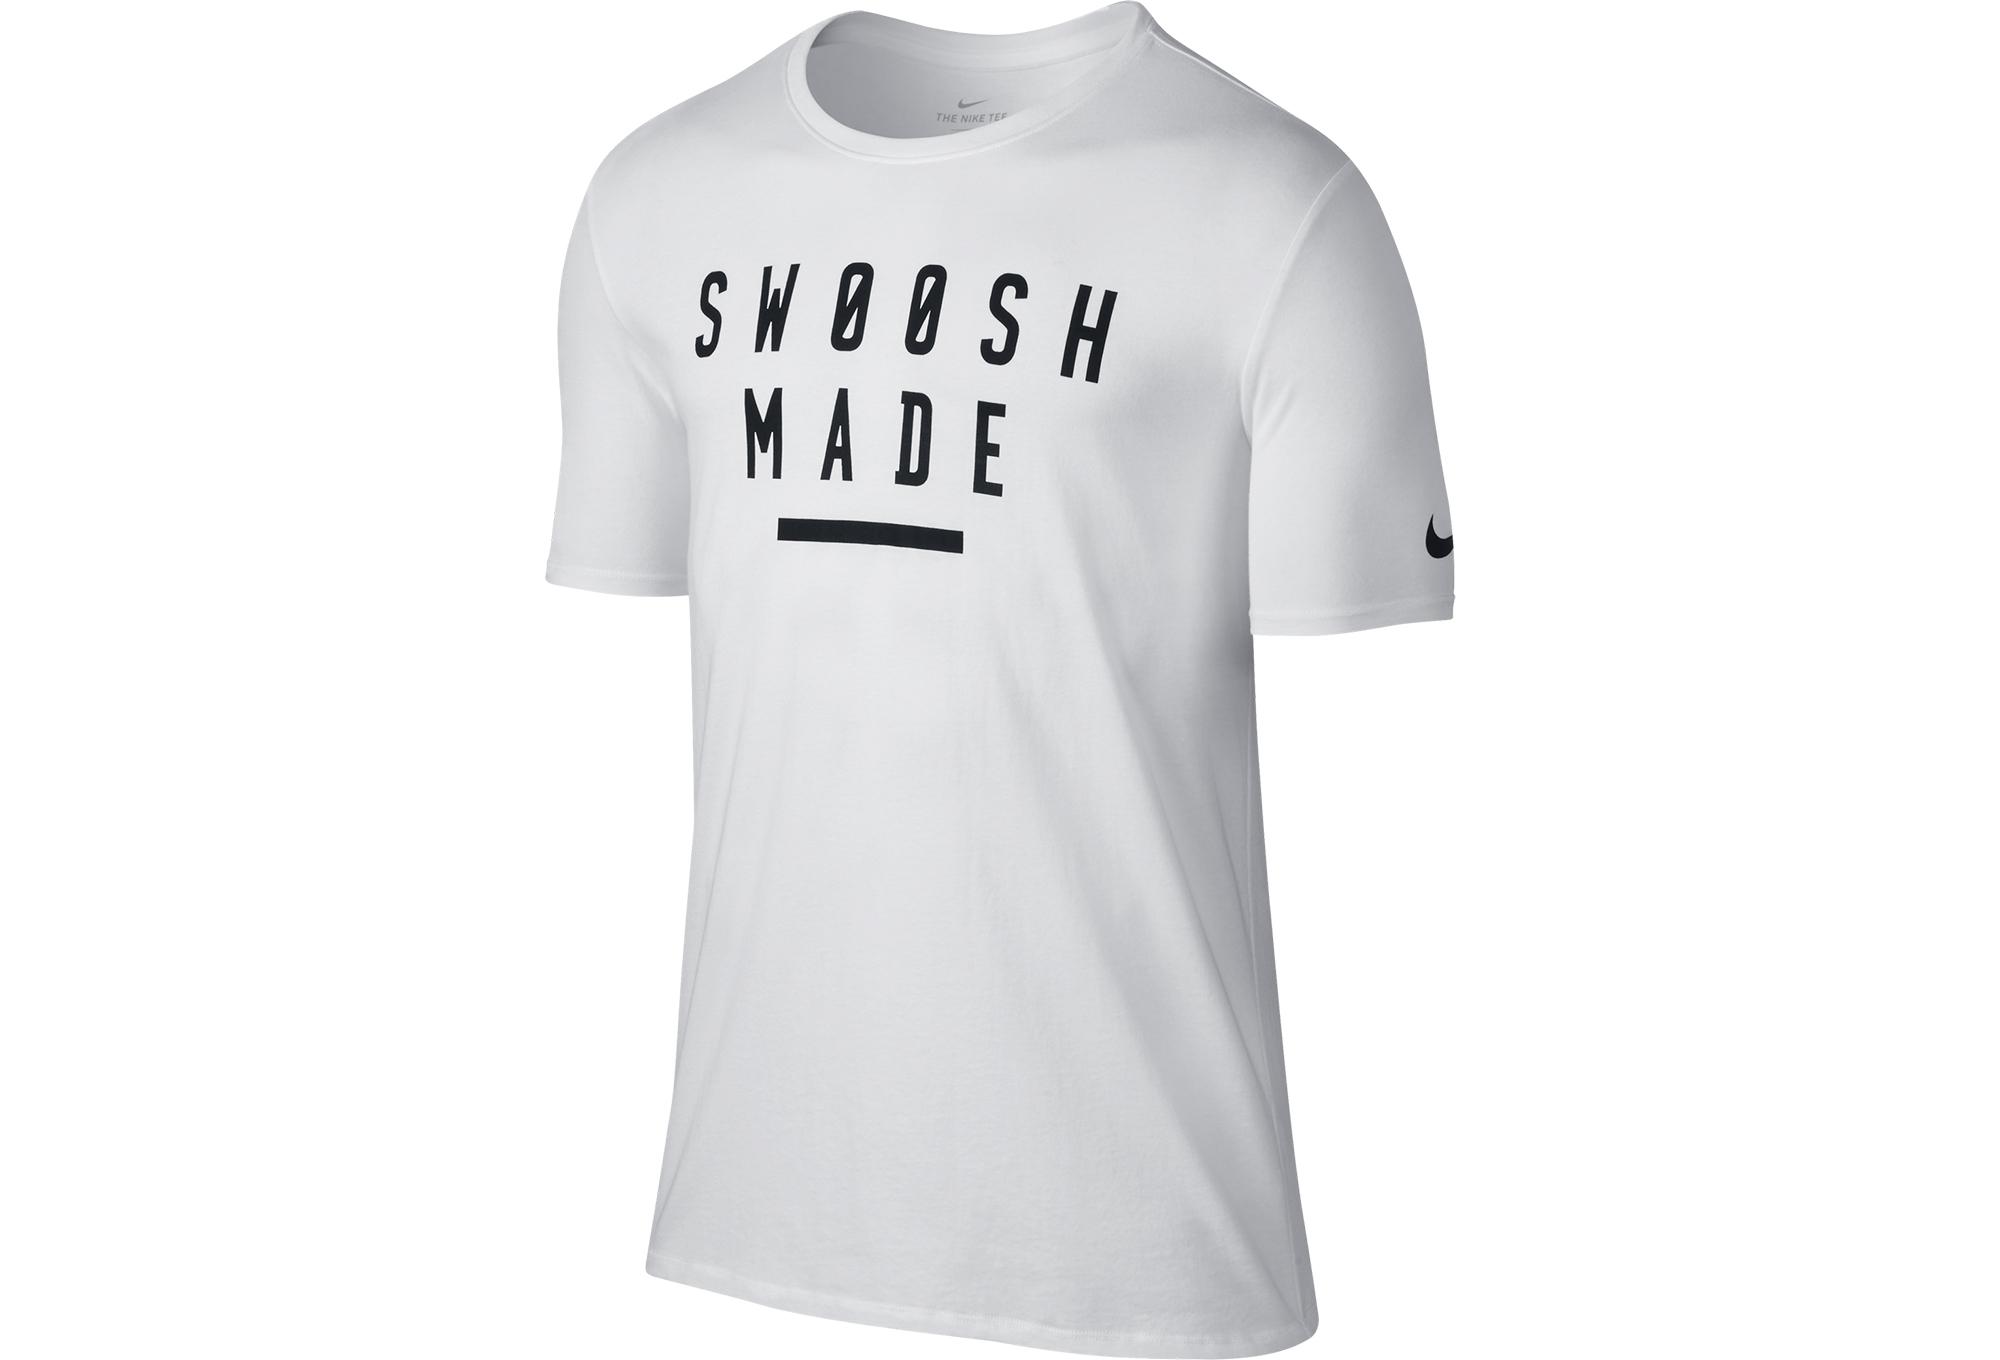 Nike Dry Swoosh Made T Shirt White